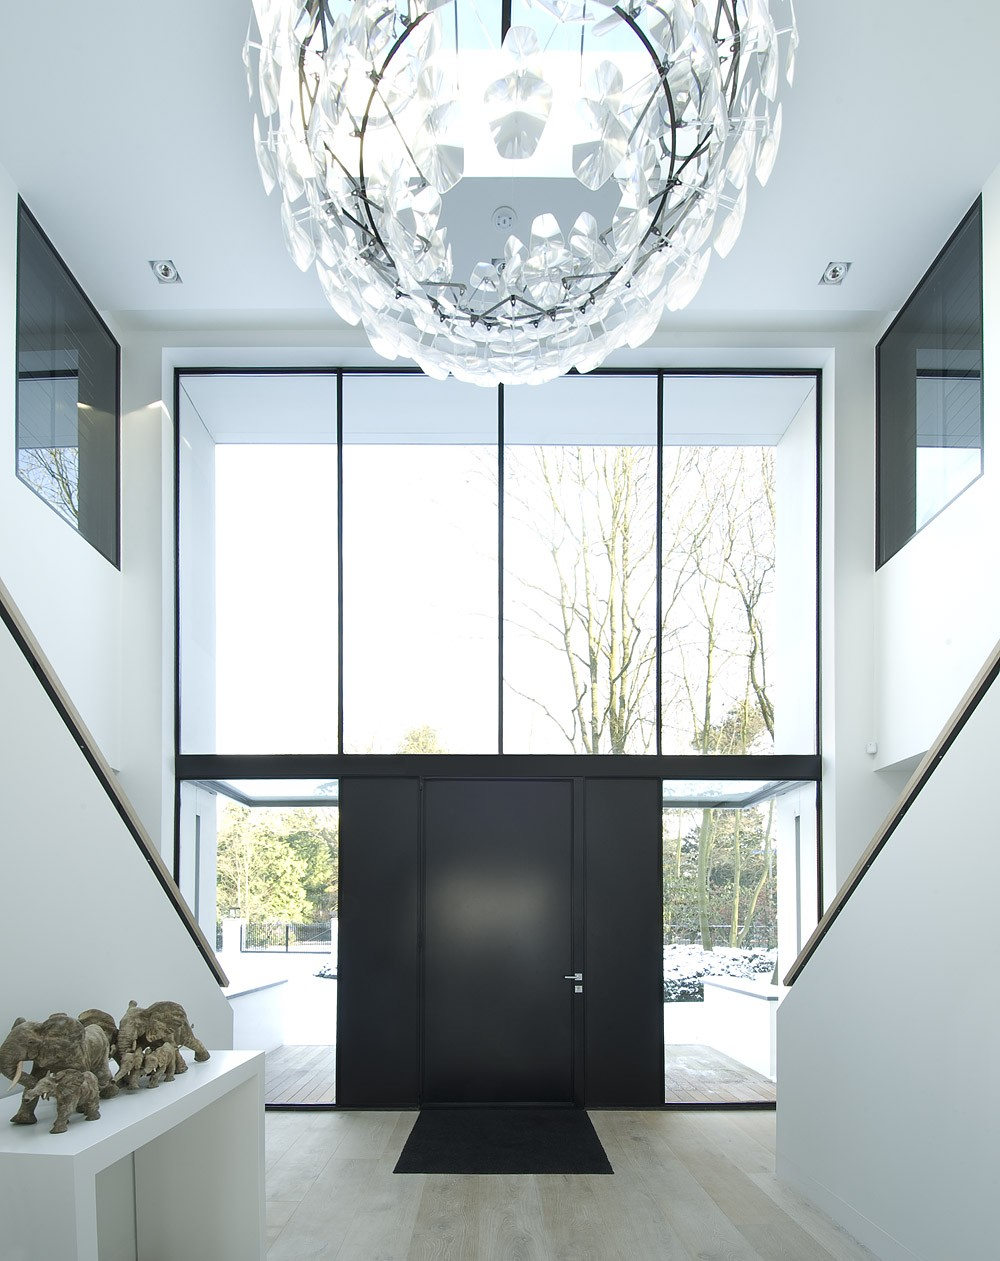 mhb bv villa. Black Bedroom Furniture Sets. Home Design Ideas